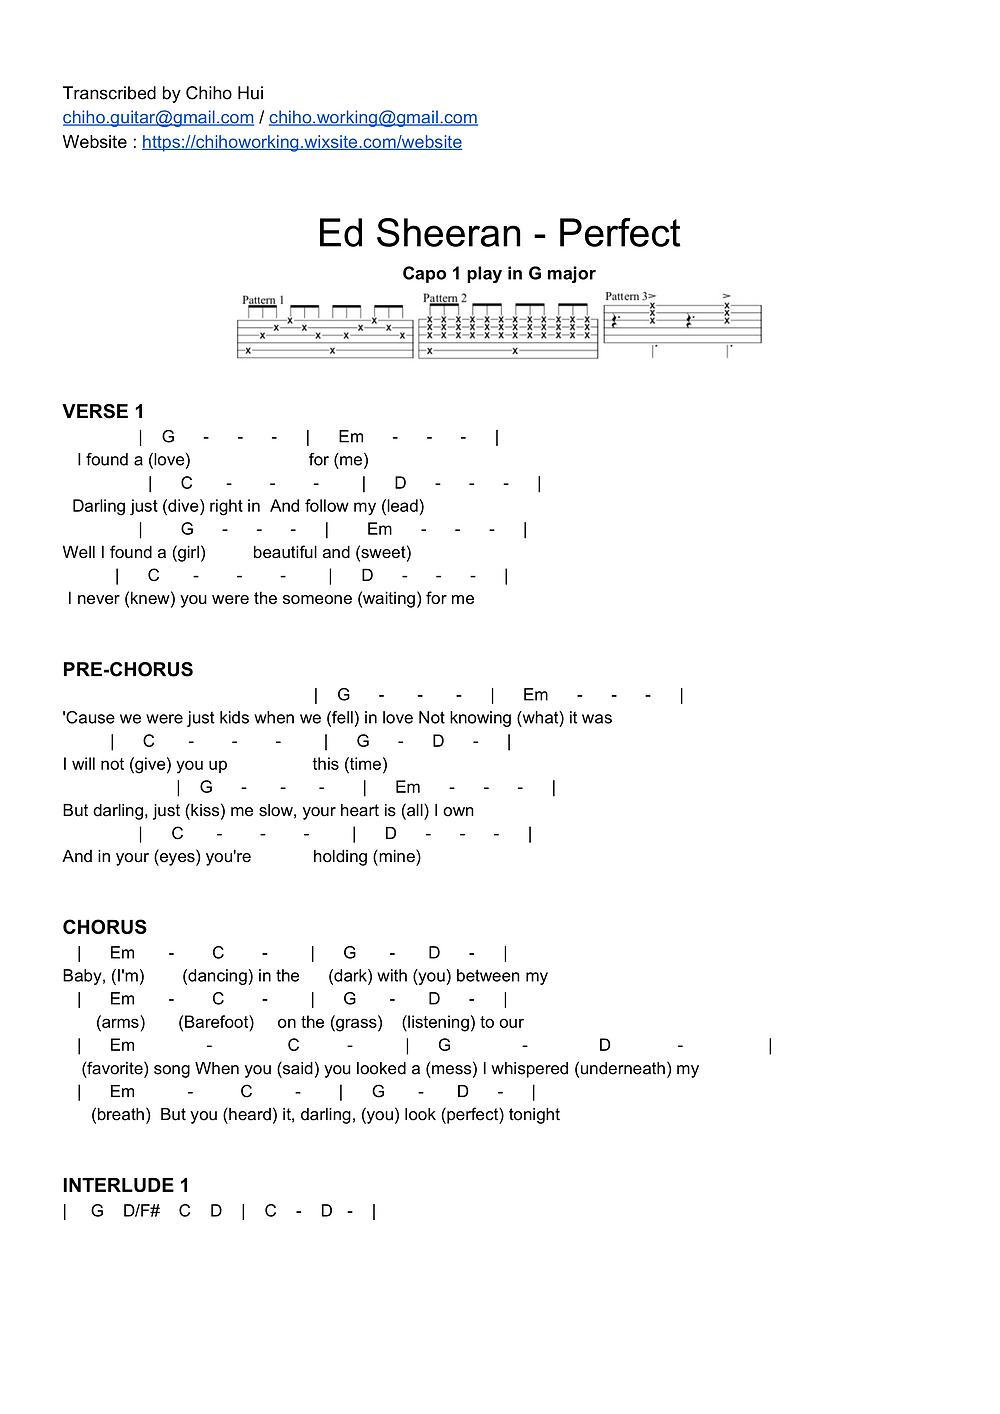 hivatalos spanyol A fején ed sheeran perfect chords without capo ...